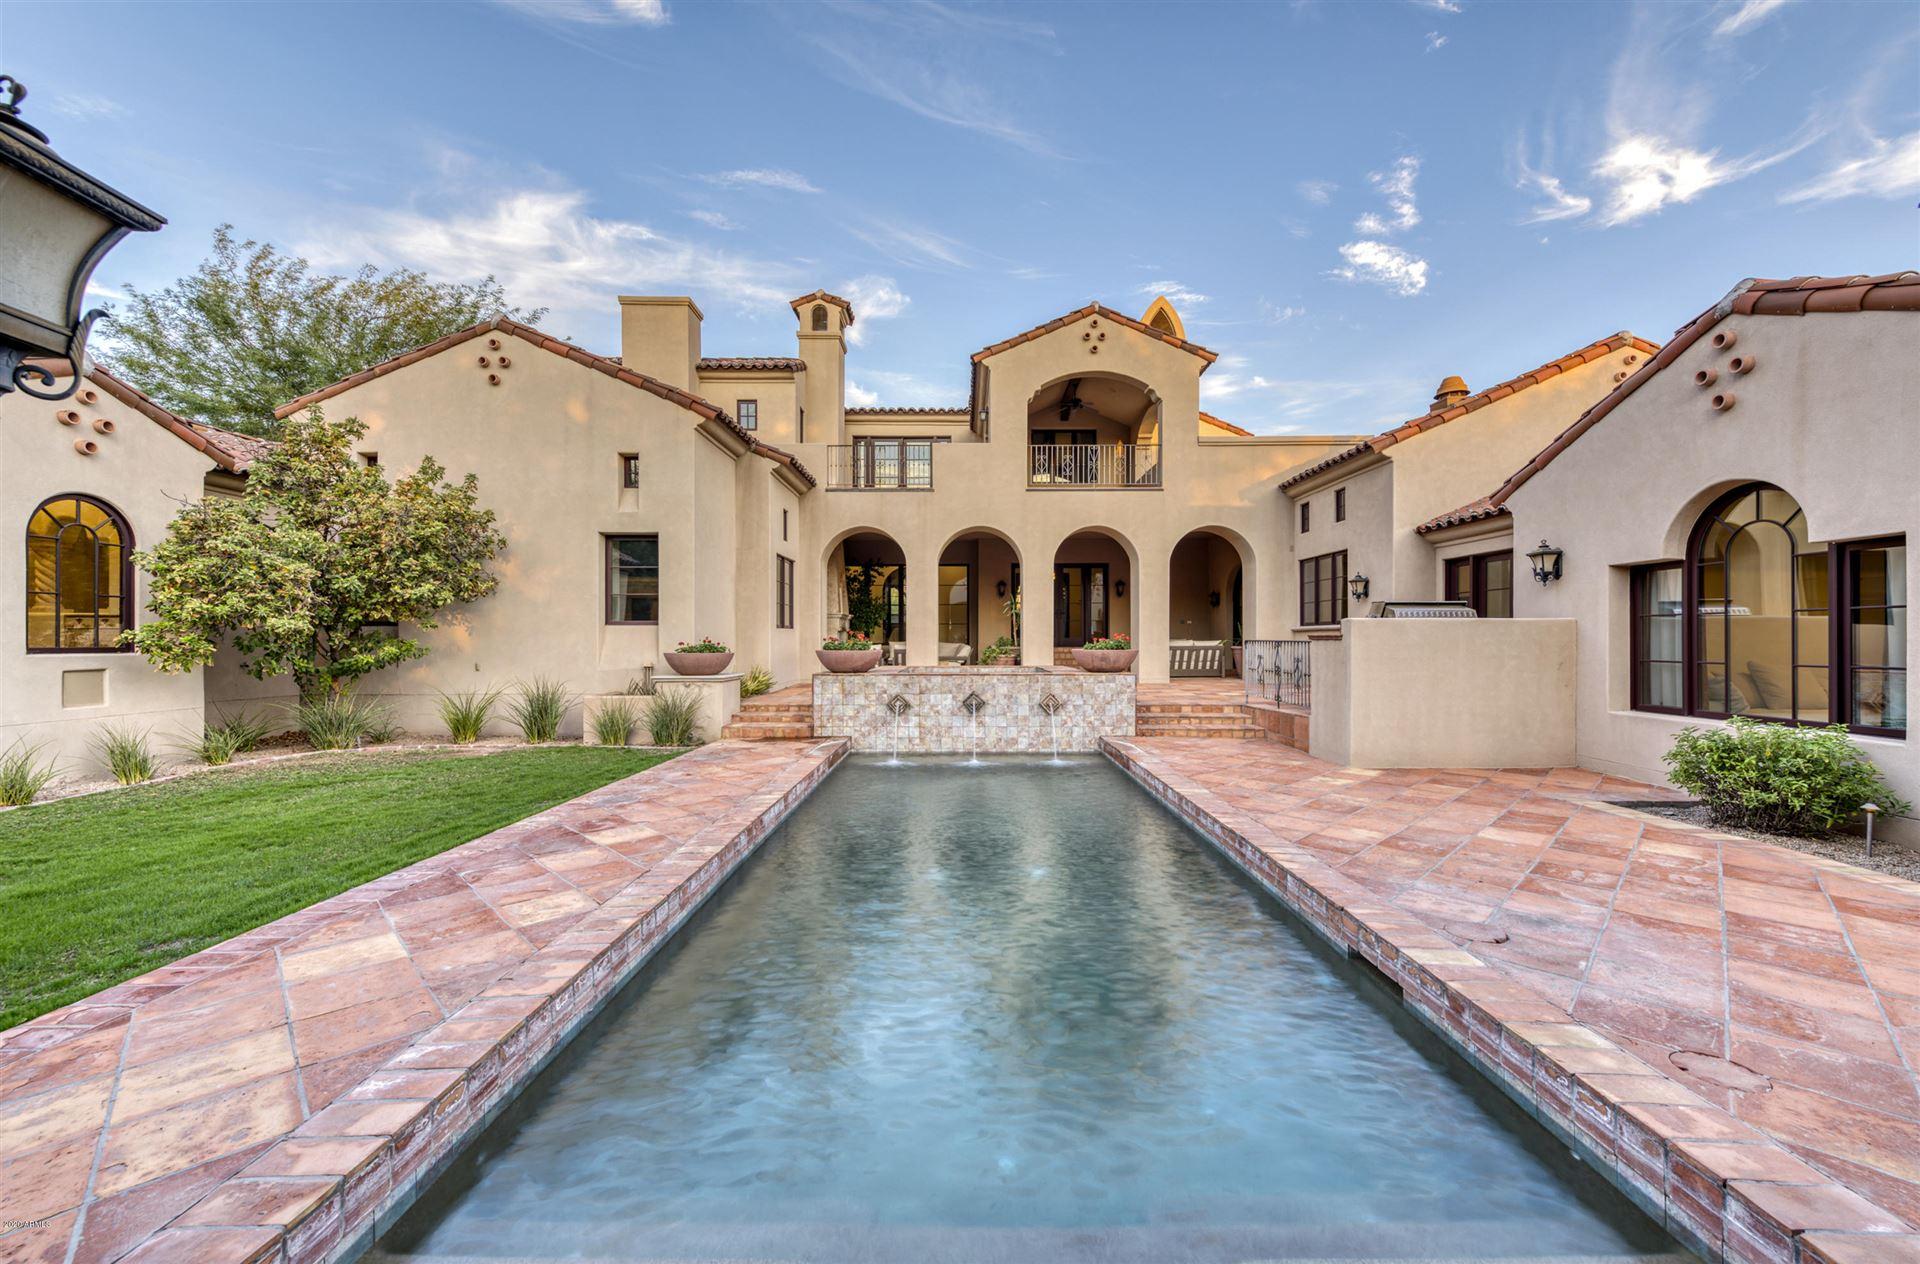 Photo of 10298 E JOURNEY Lane, Scottsdale, AZ 85255 (MLS # 6141945)